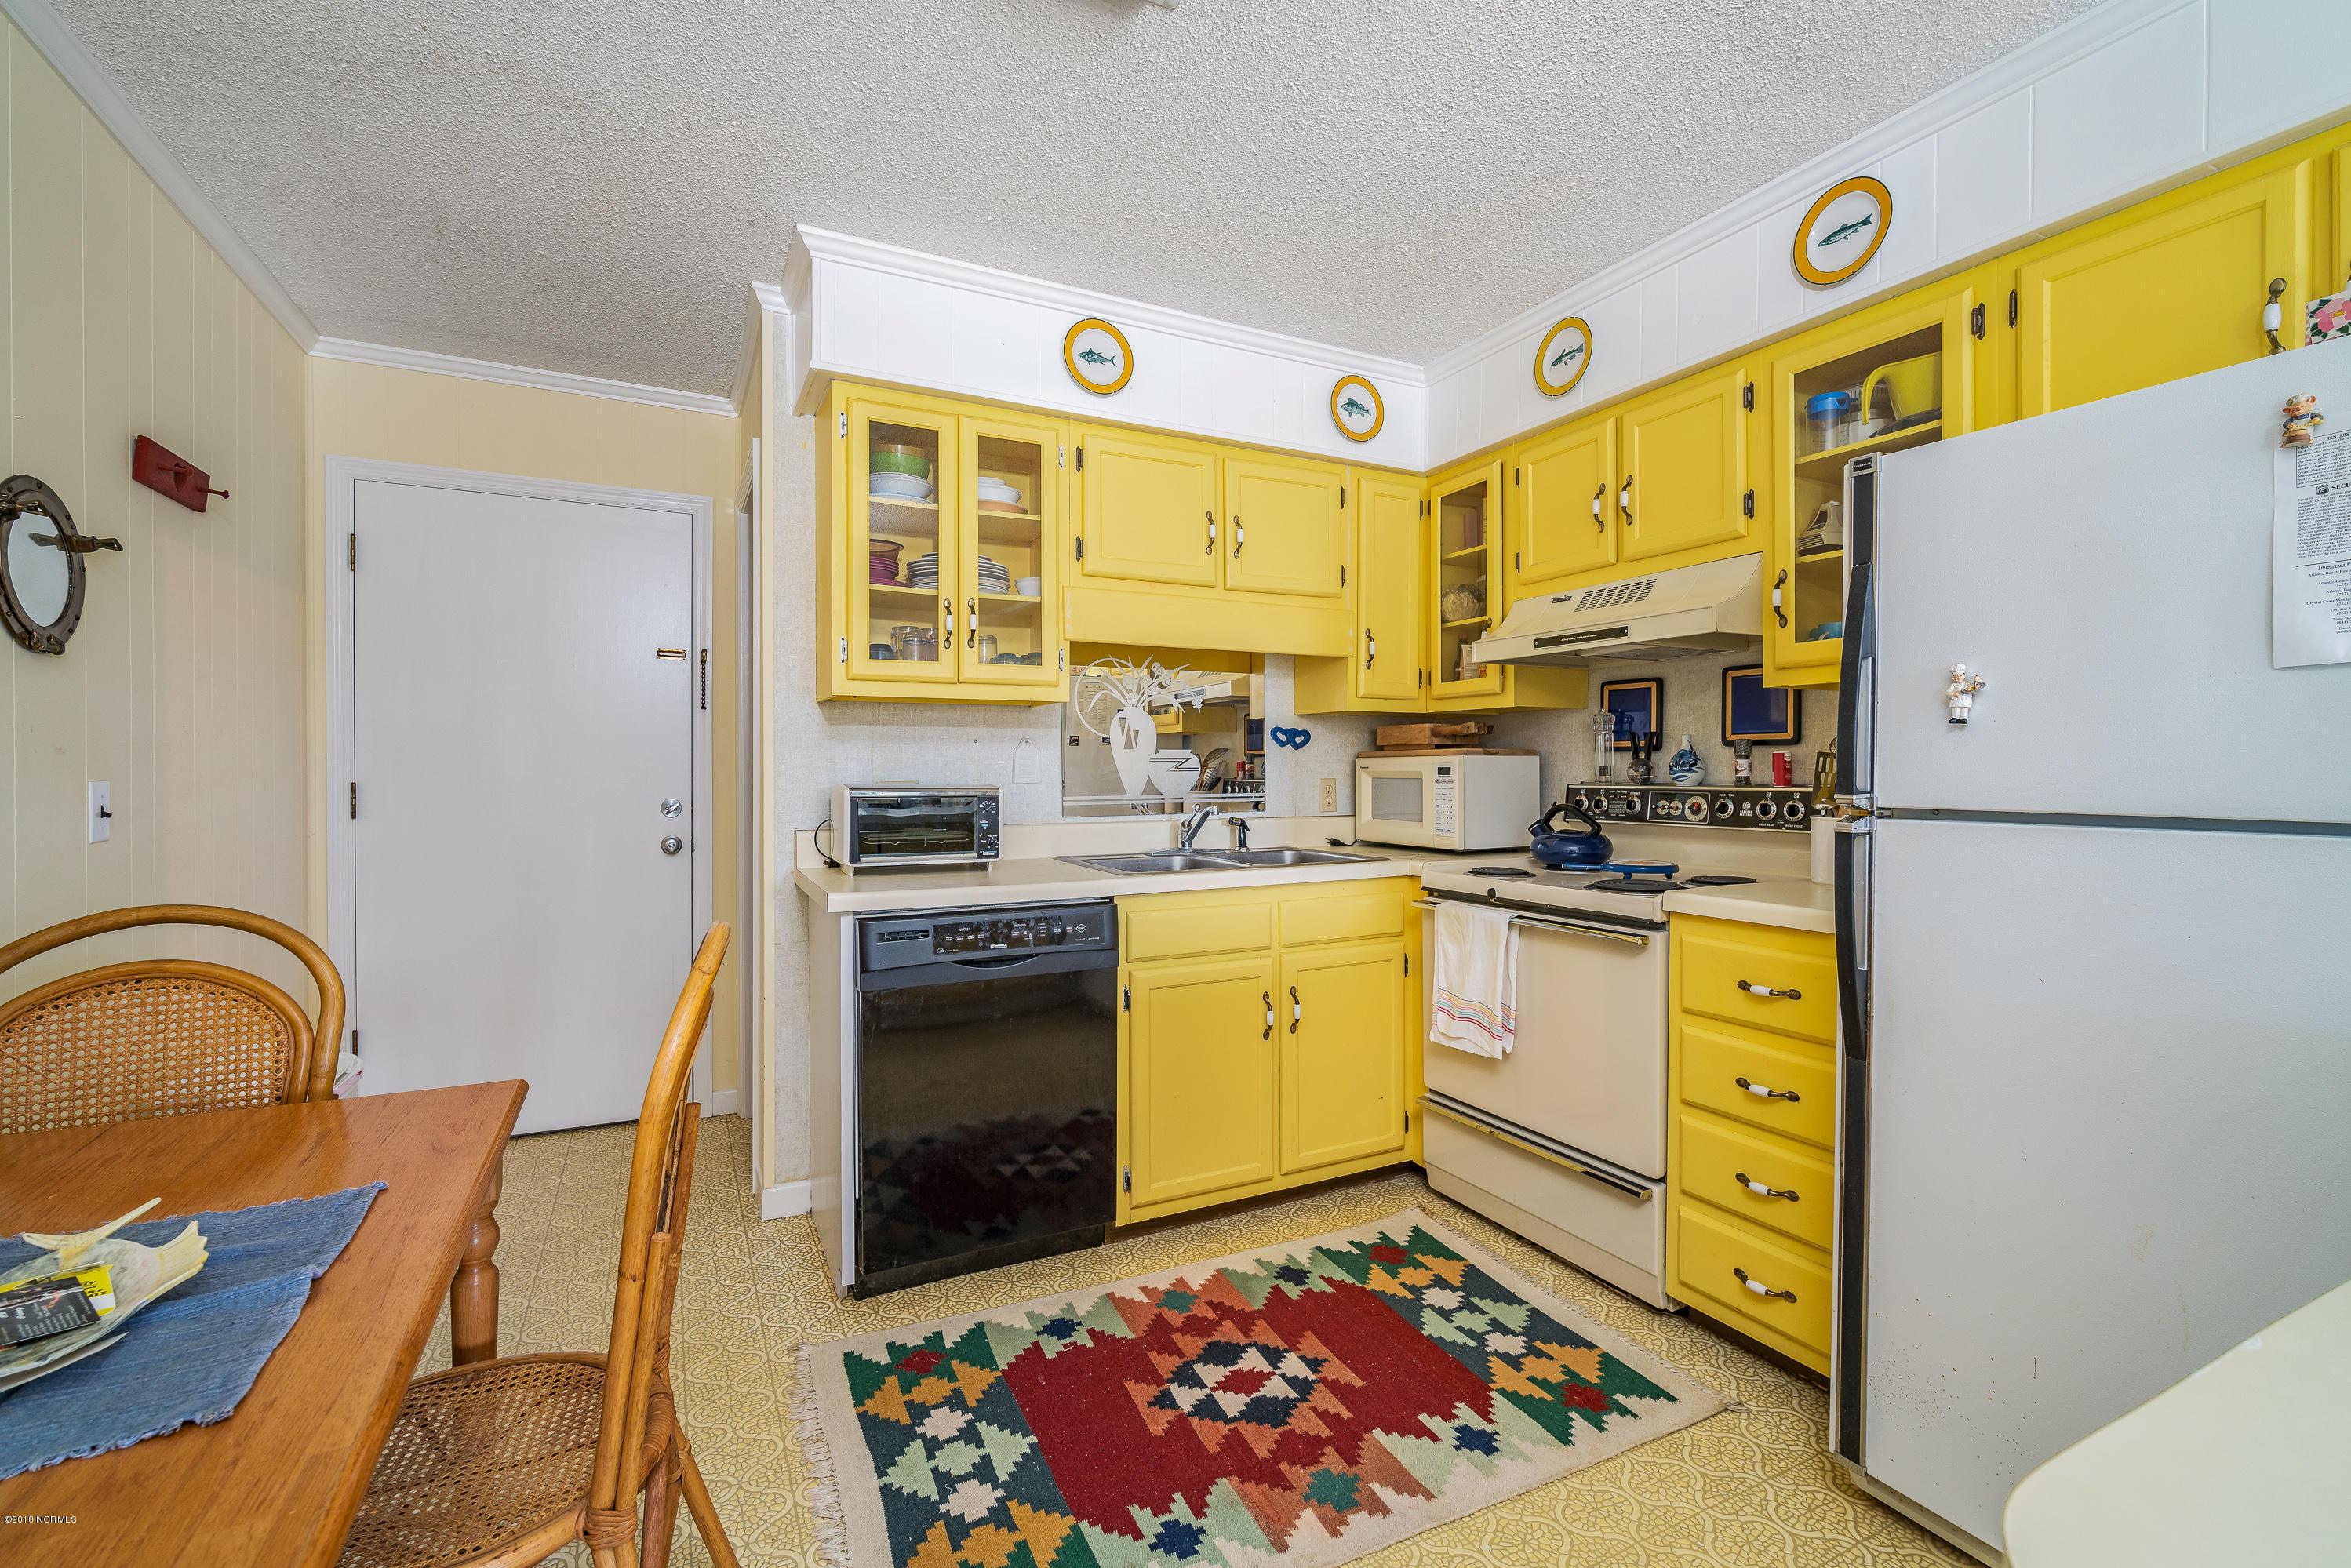 301 Commerce Way Road, Atlantic Beach, North Carolina, 2 Bedrooms Bedrooms, 3 Rooms Rooms,2 BathroomsBathrooms,Condominium,For sale,Commerce Way,100101782